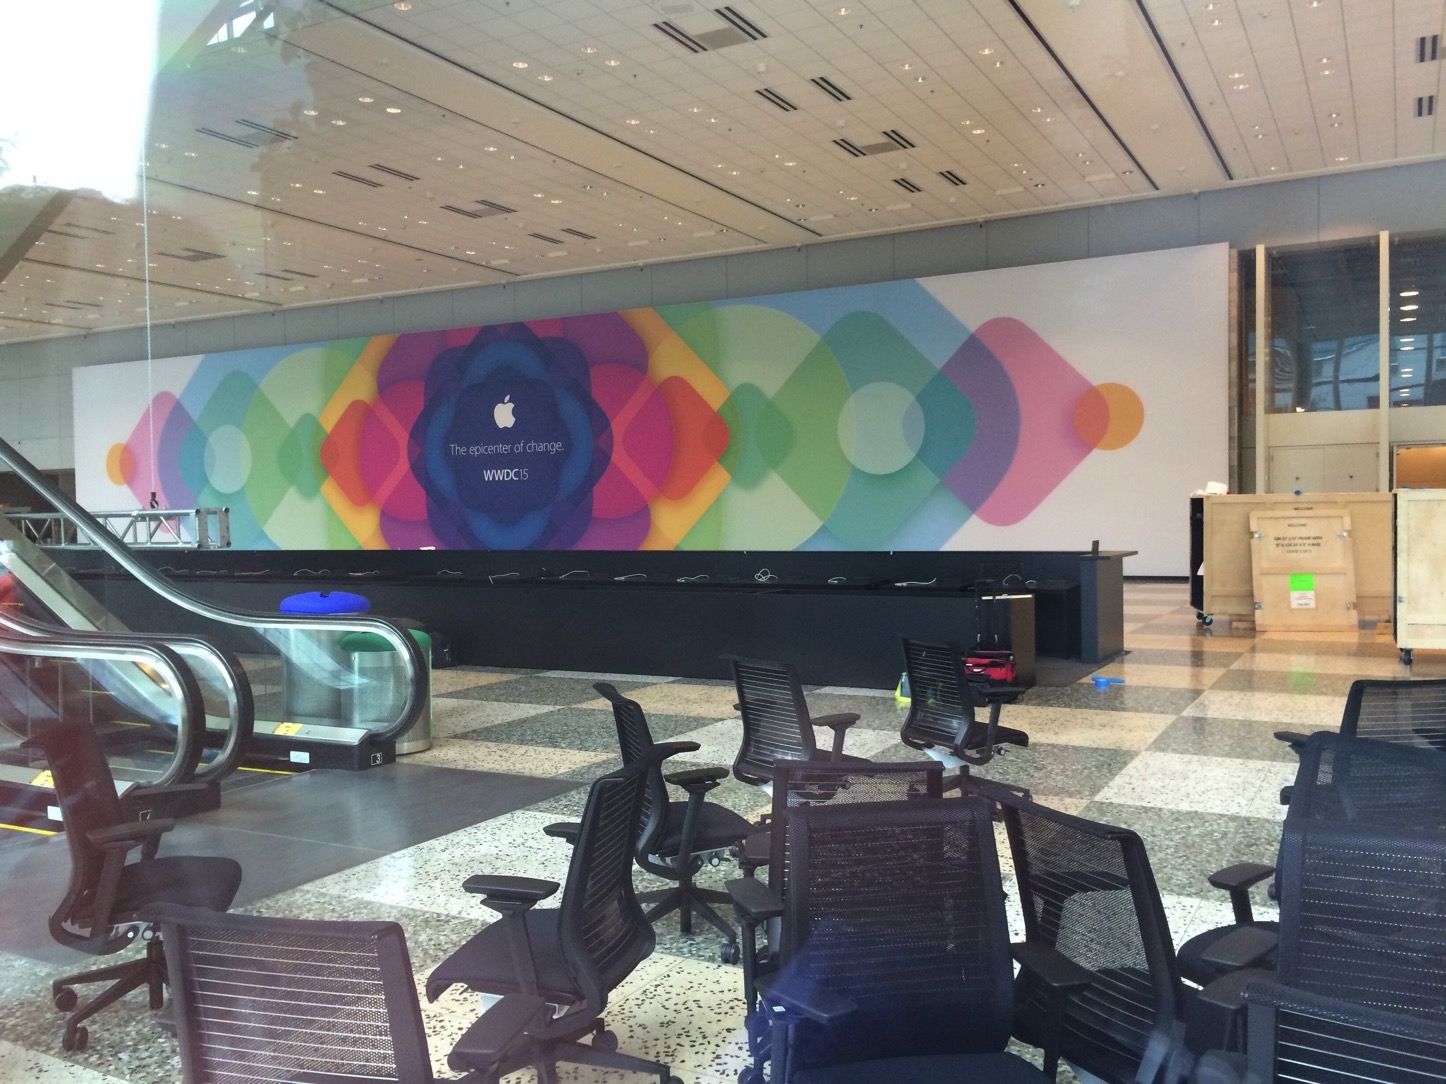 WWDC2015 Moscone Center